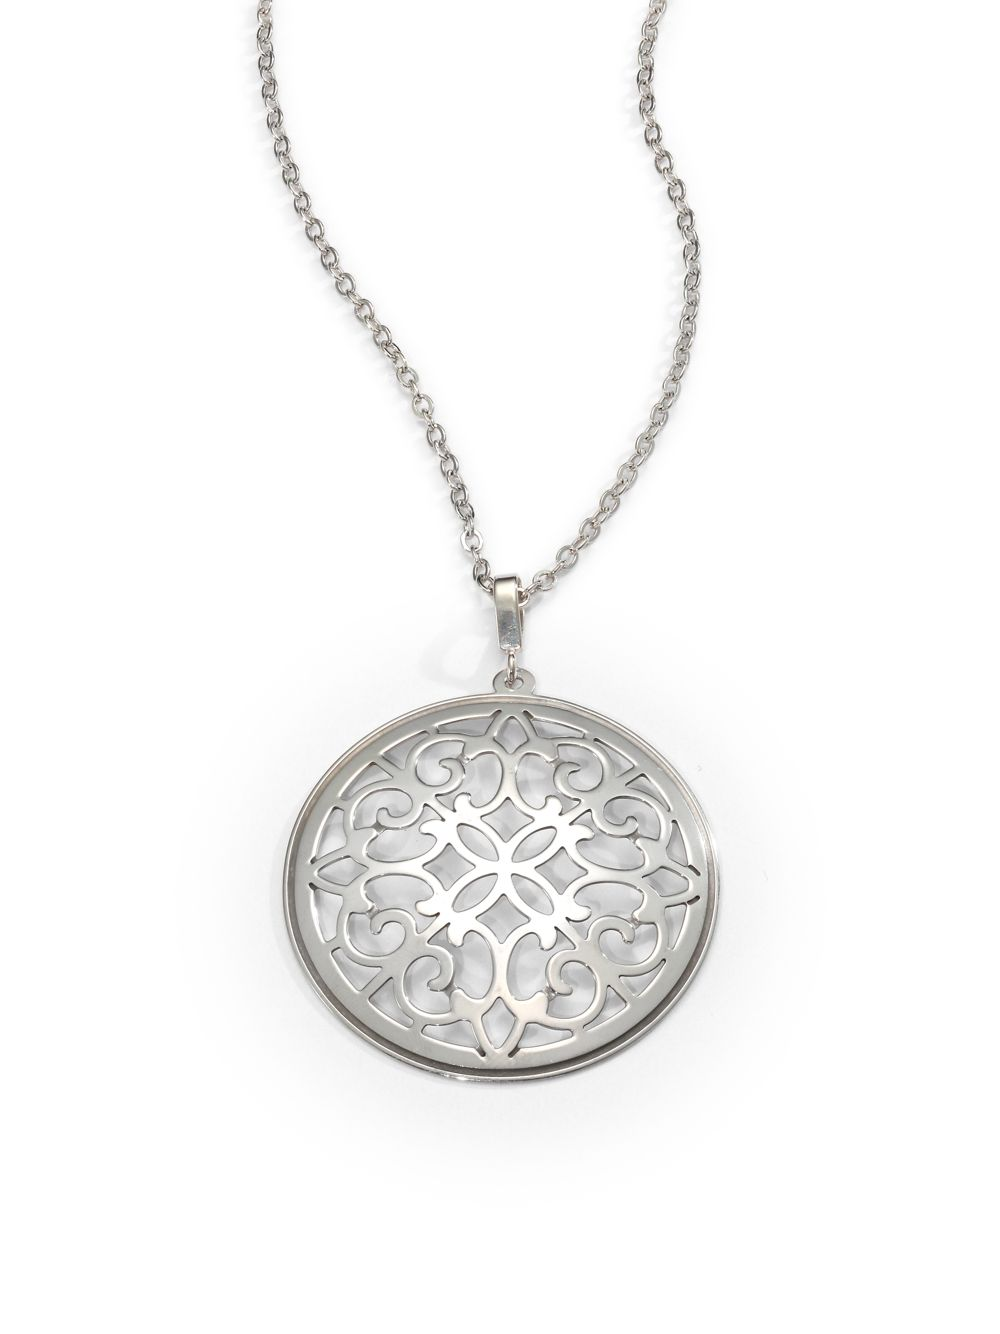 Saks fifth avenue jewelry designers / Print Discount